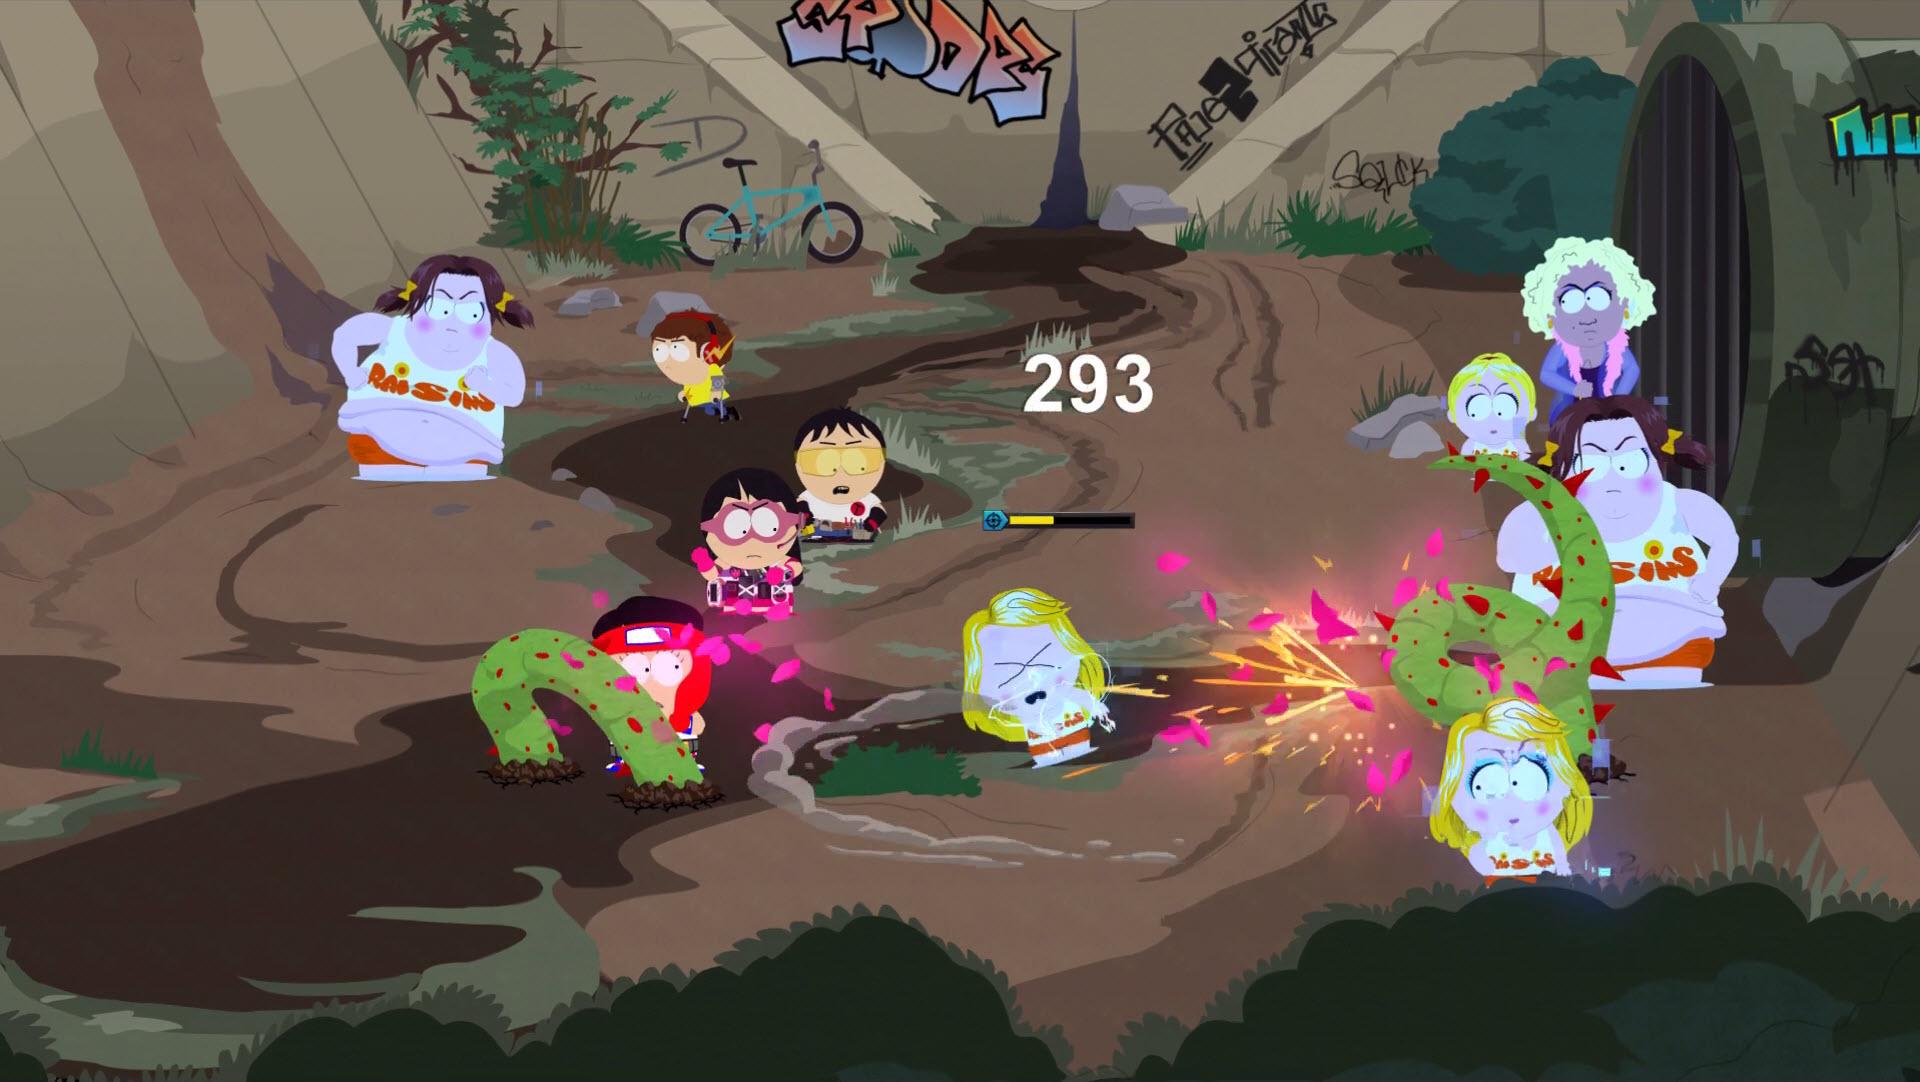 South Park: The Fractured But Whole - DLC 1 Danger Deck